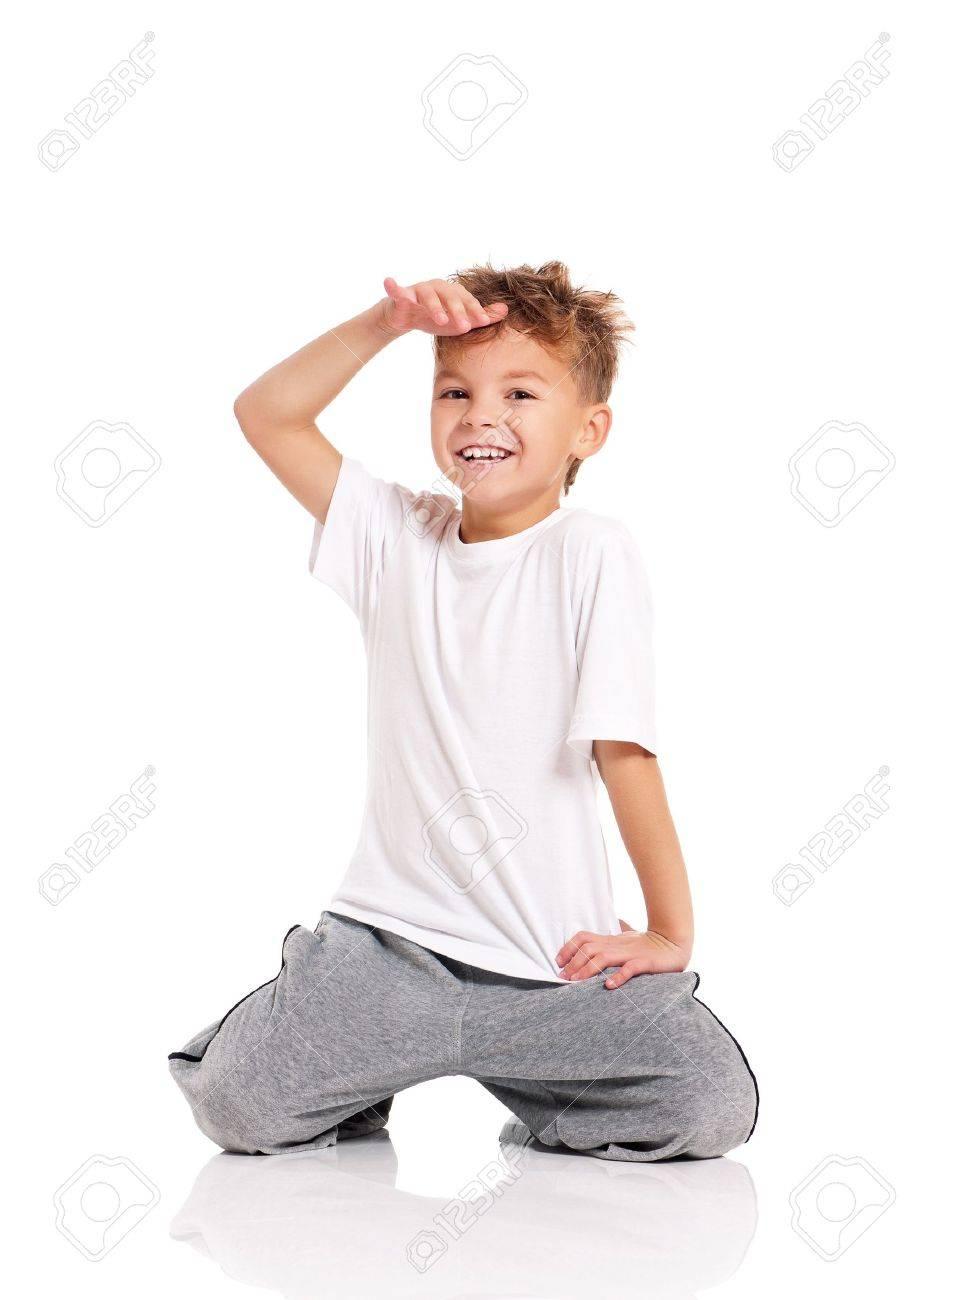 Boy dancing Stock Photo - 17600505